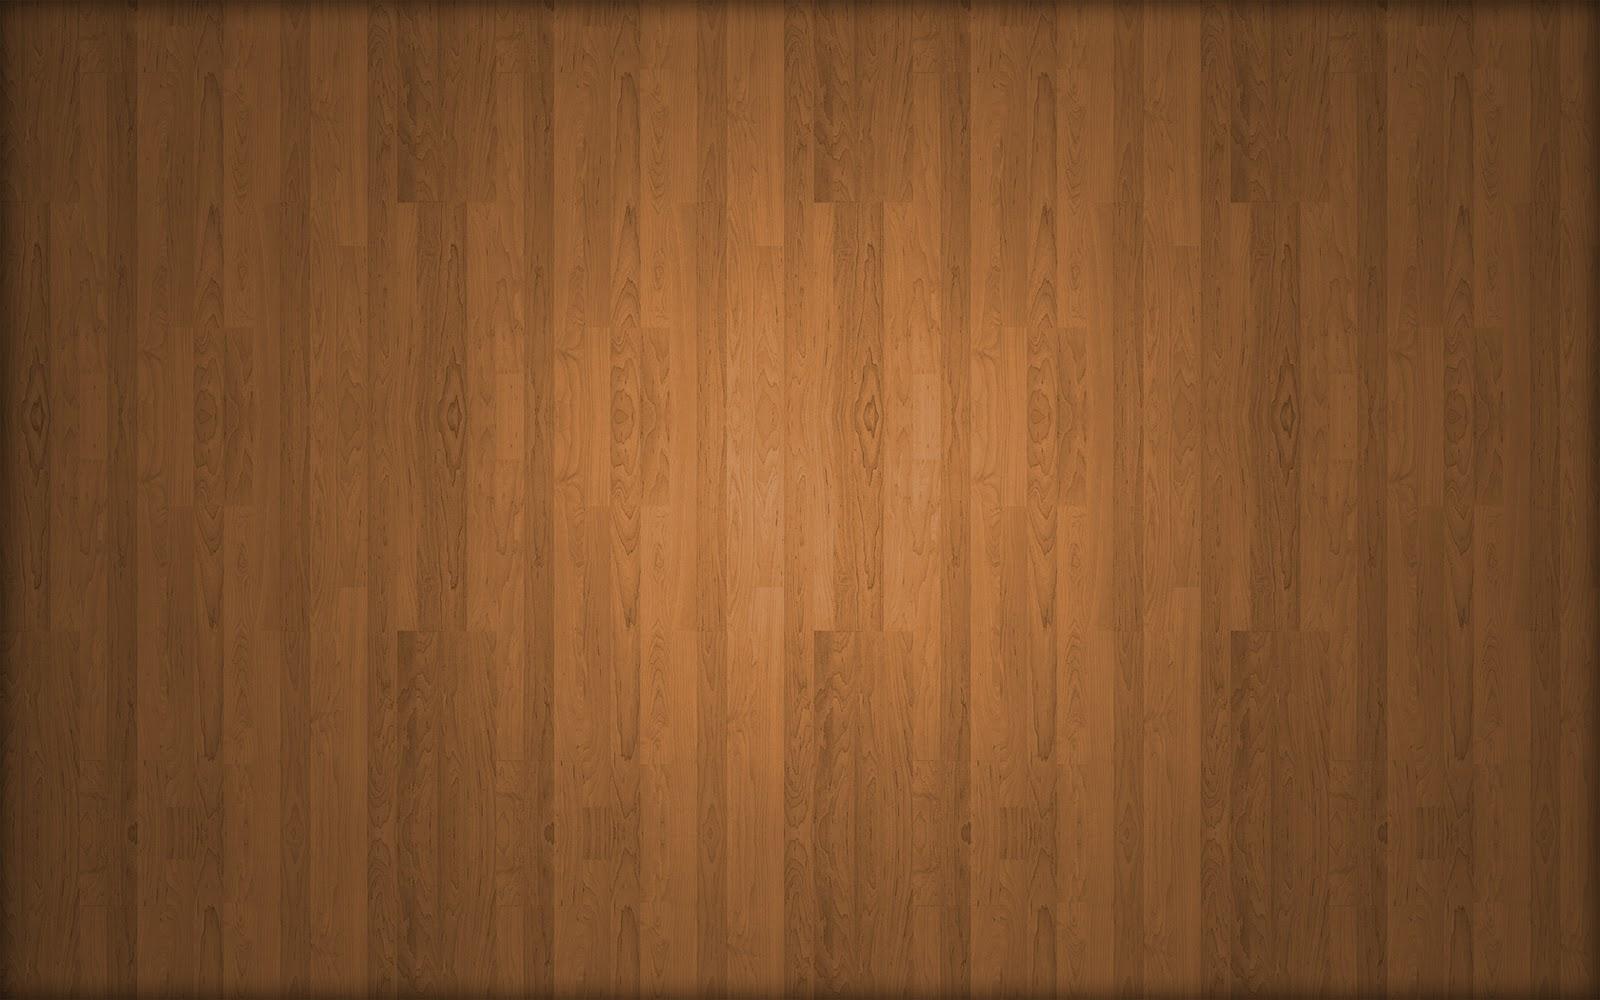 ... houten planken achterrond houten vloer wallpaper hout wallpaper